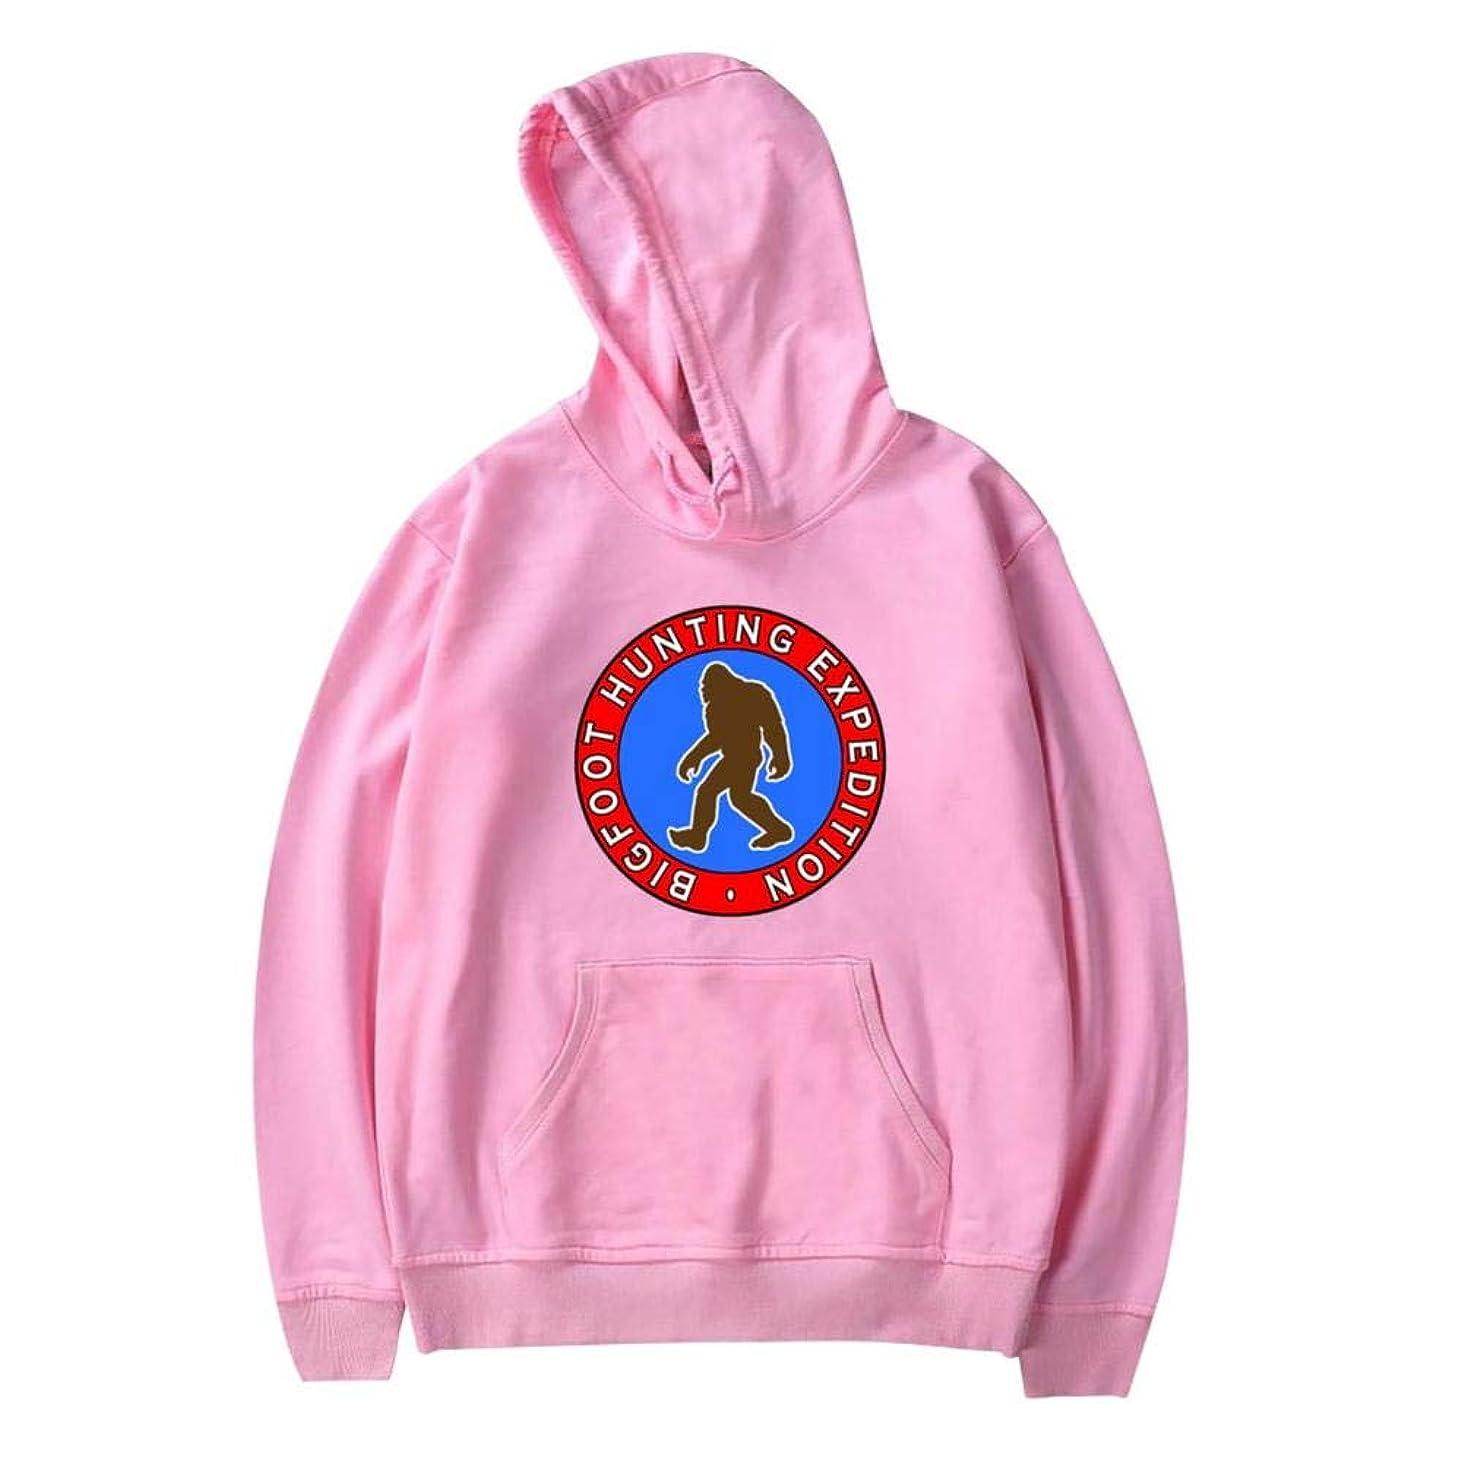 Aslgisy Boy Girl Hooded,Fashion Bigf-oot Hunting Expedition Printed Velvet Pocket Youth Fashion Hoodies